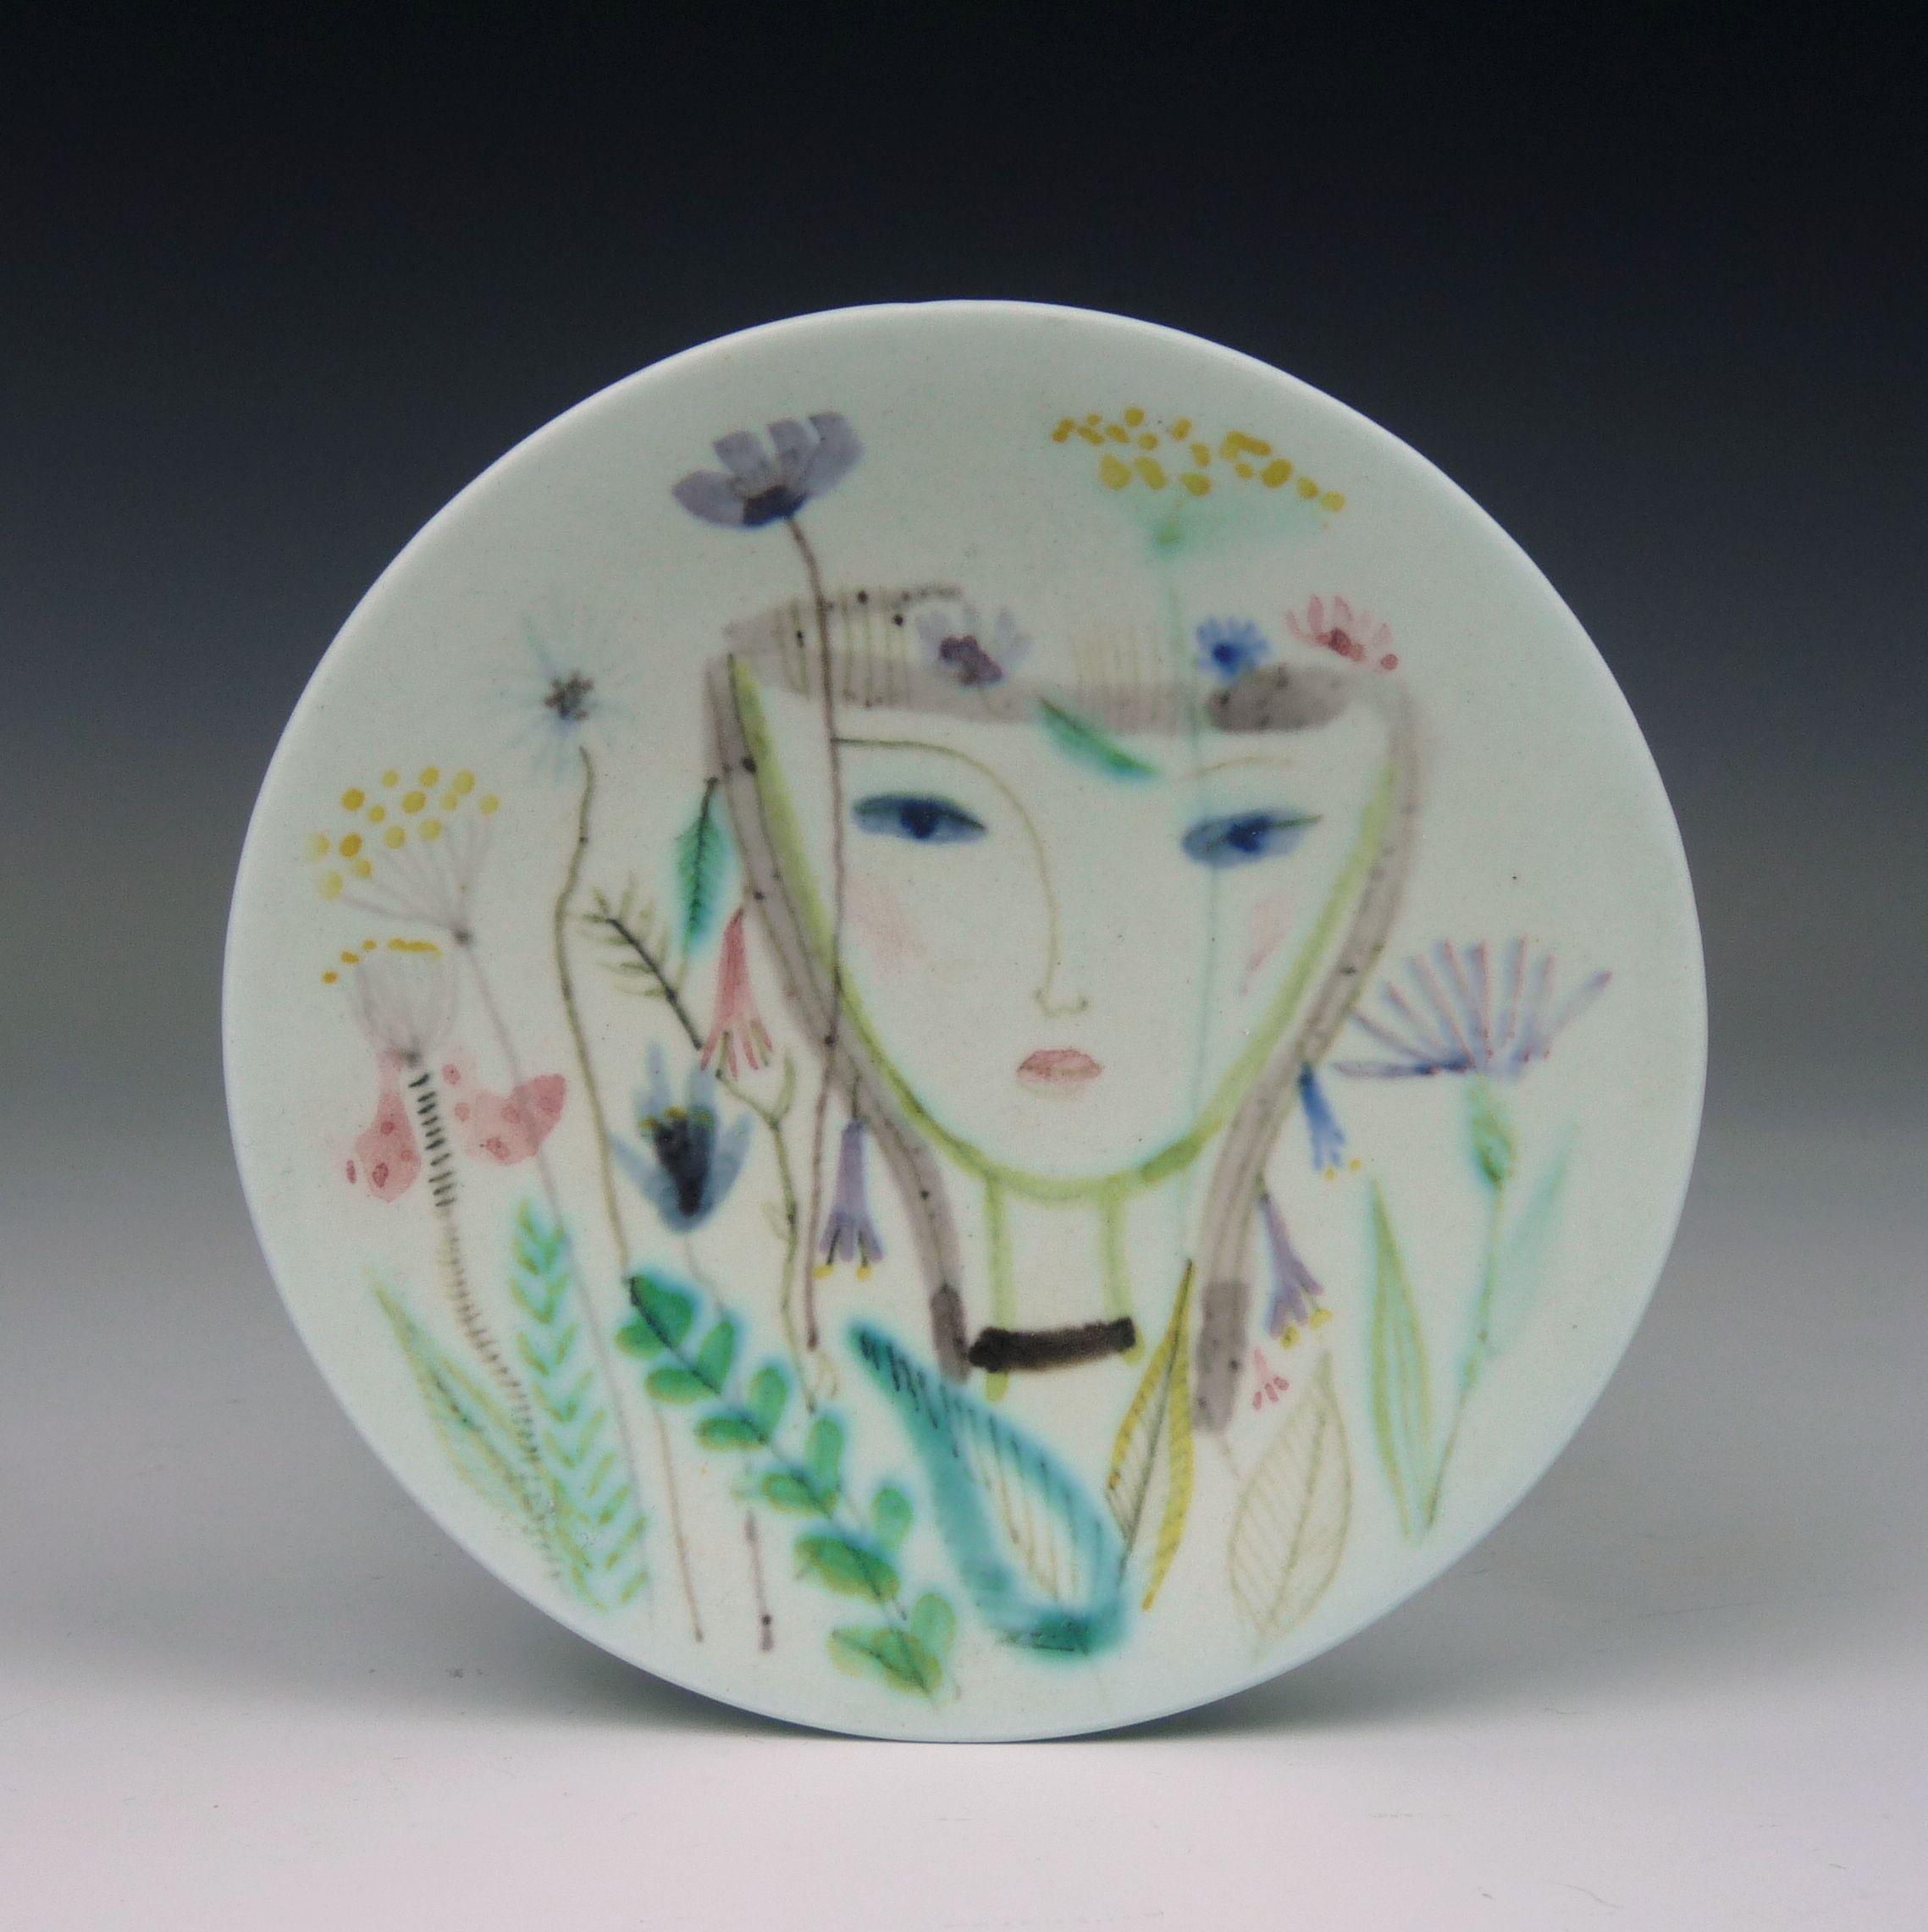 Gustavsberg, a unique plate by Stig Lindberg